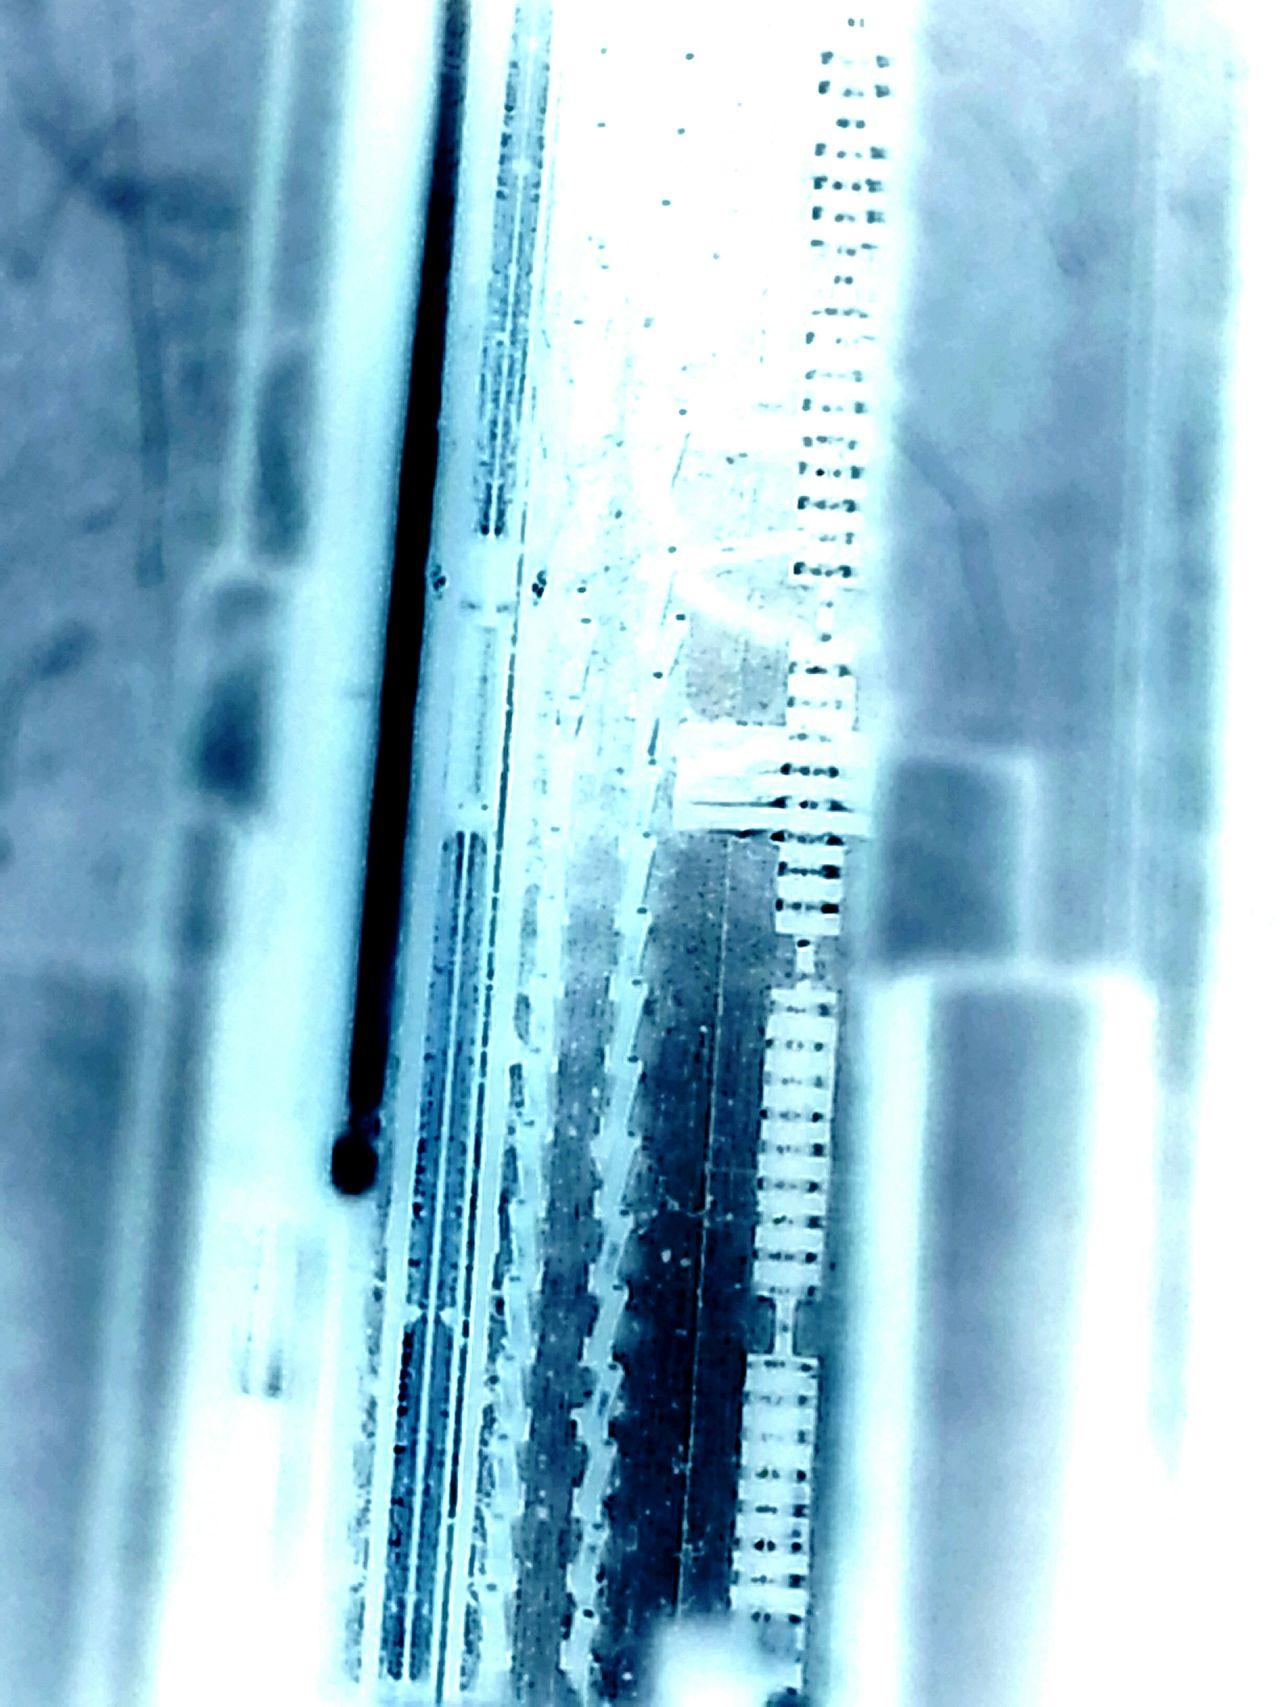 Sky Inside Kriptonyte Transistor (Τρανζίστορ) Transistor Moments Gear Coast